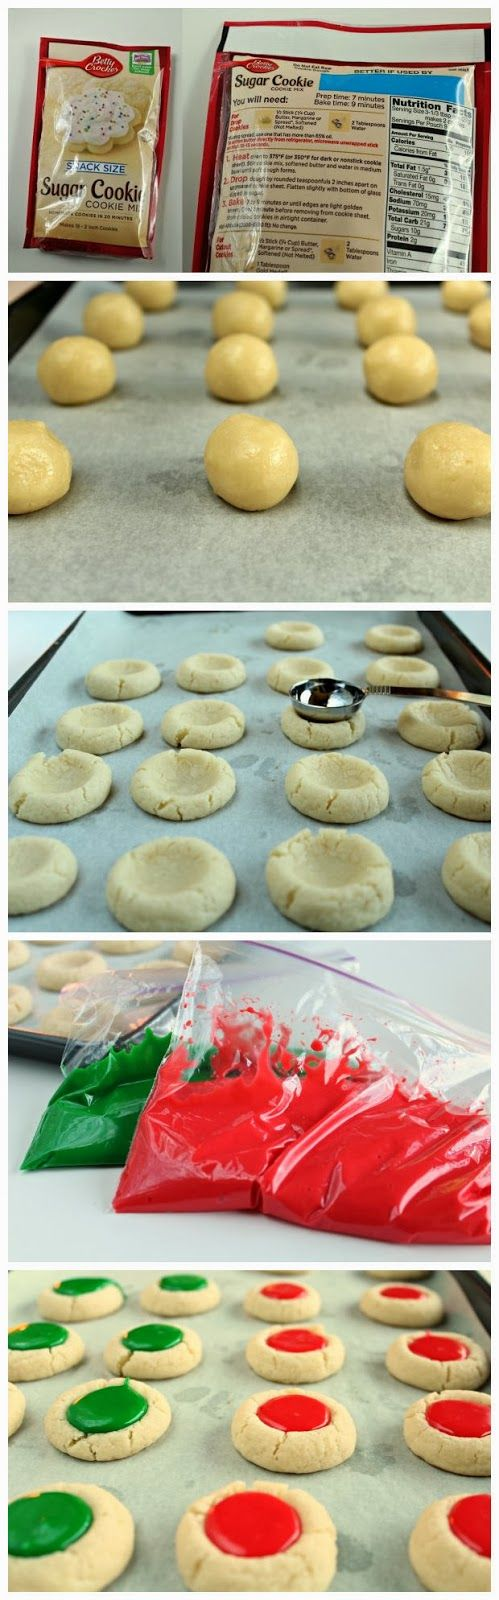 Christmas Thumbprint Cookies - I'd use my grandma's sugar cookie recipe, not premade stuff.